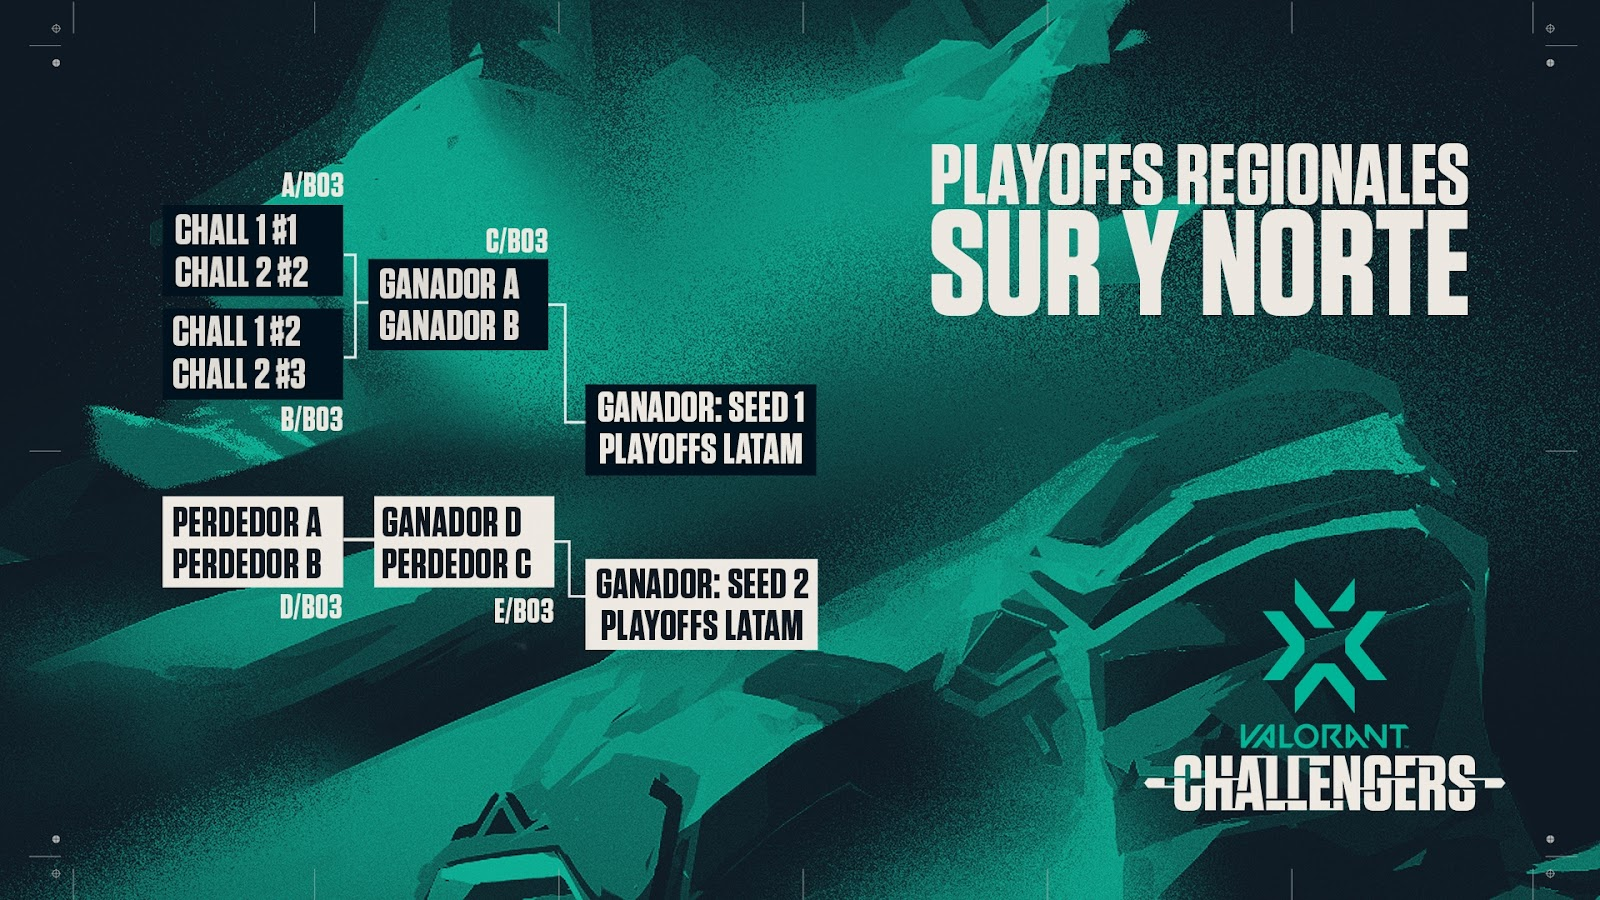 VCT_LATAM_Challengers_Stage3_03_Playoffs.jpg